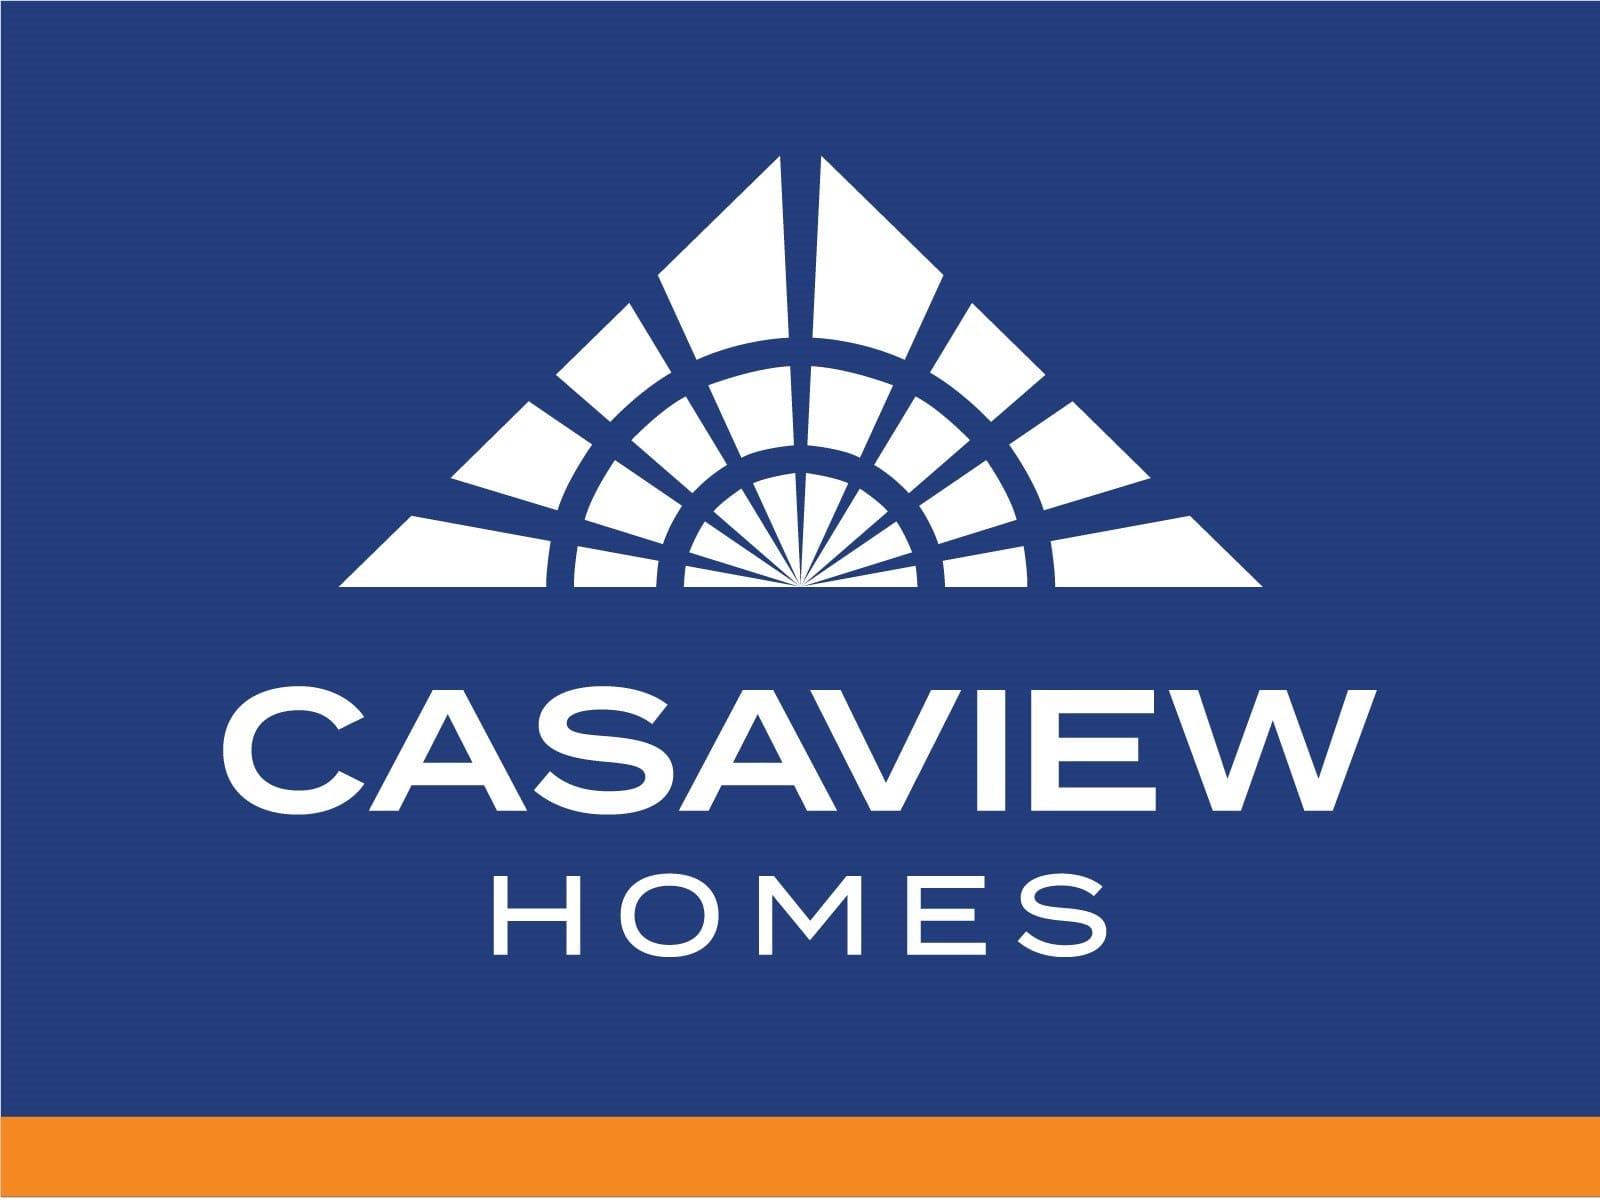 Property Lot 634 Mare St -  Futurity Rise Estate, Box Hill NSW 2765 secondary IMAGE